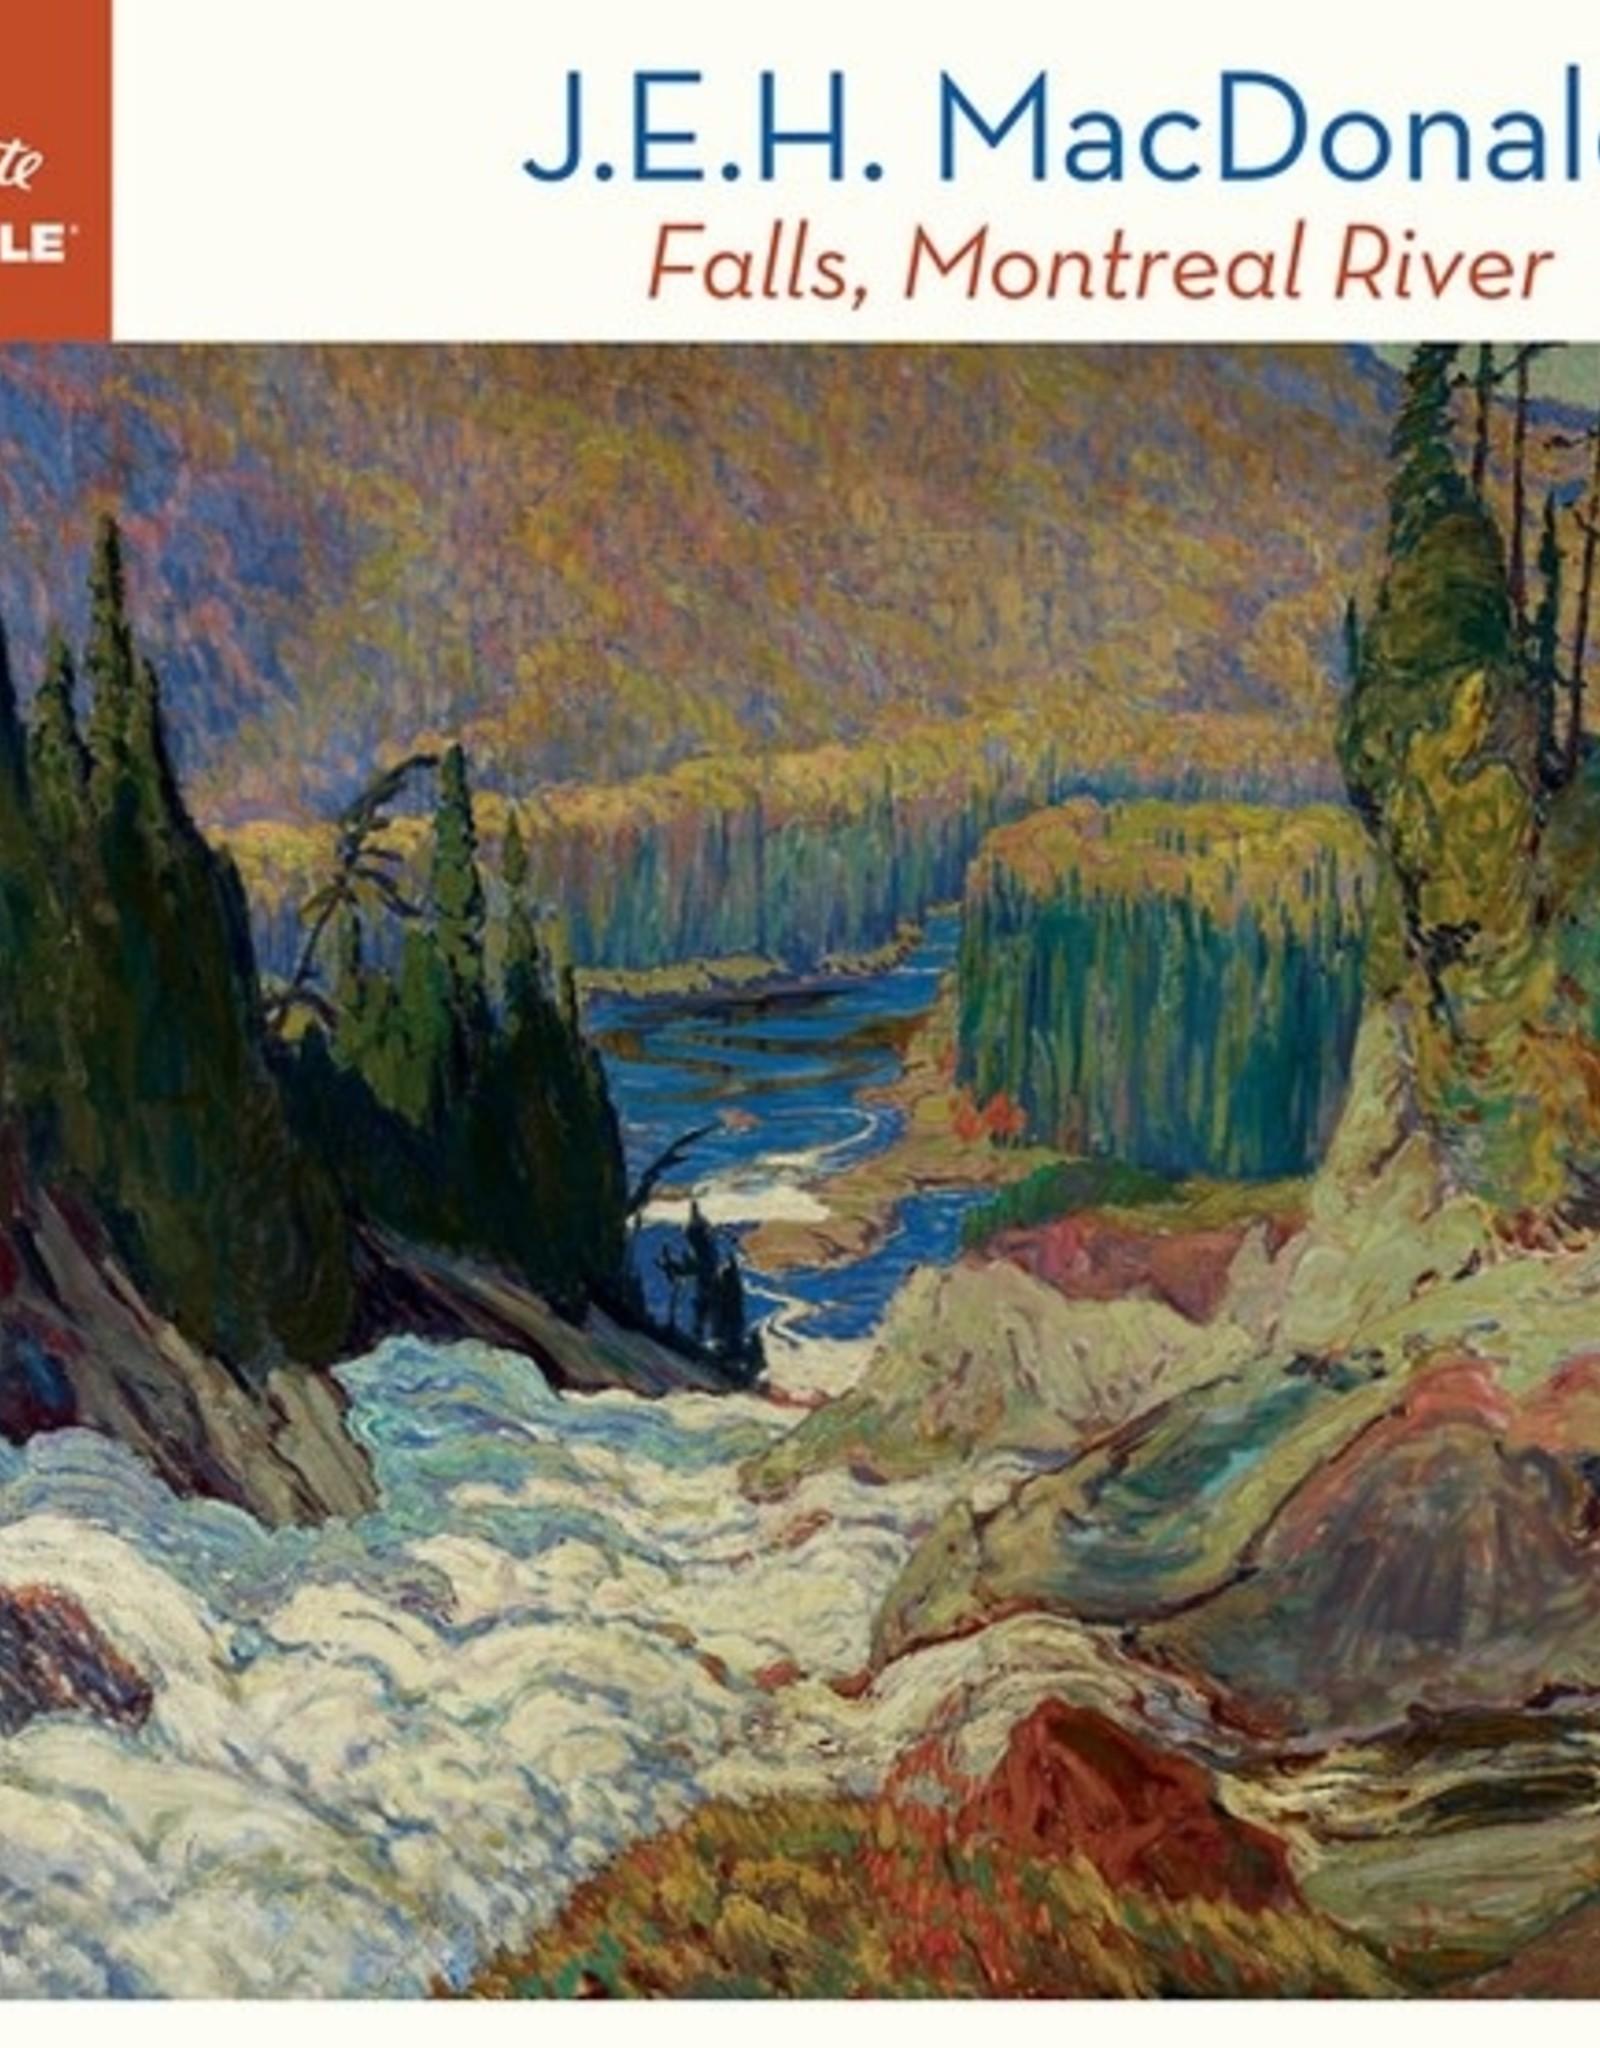 Pomegranate 1000 pc J.E.H. MacDonald: Falls, Montreal River Puzzle